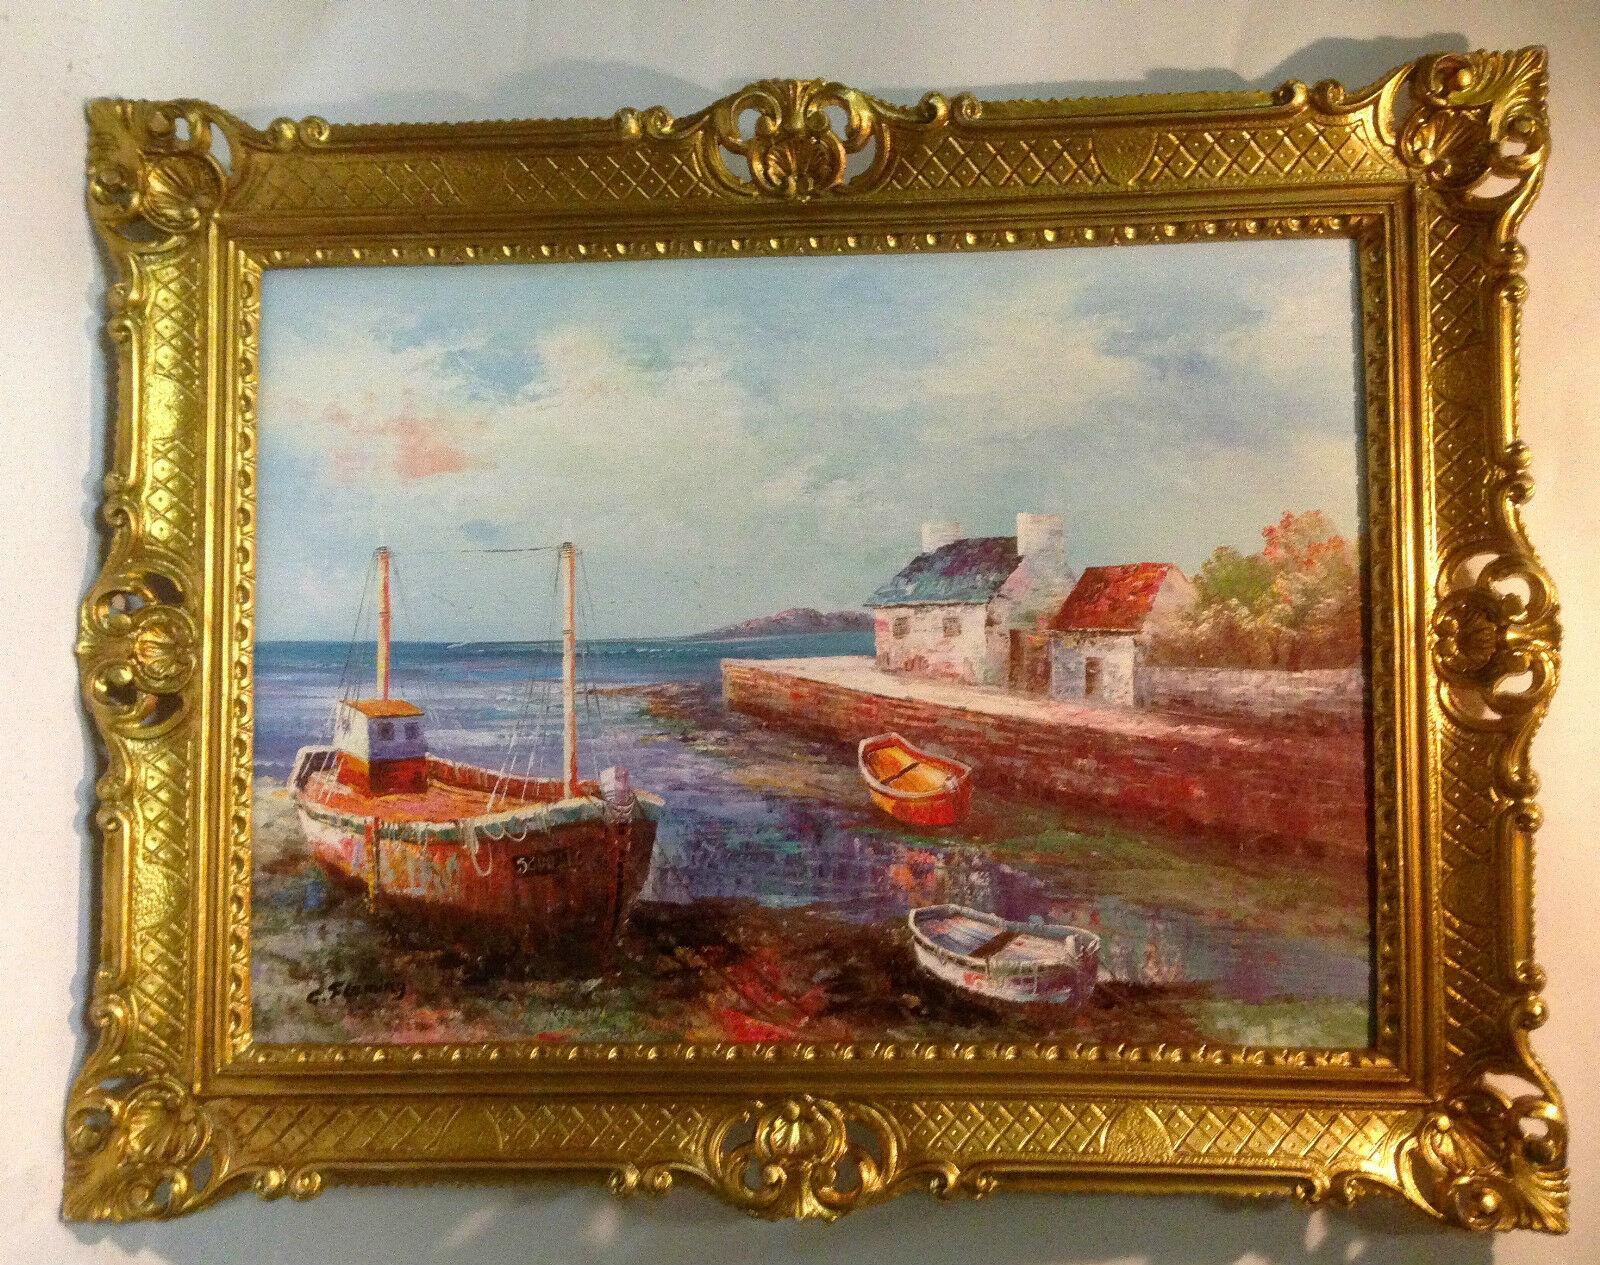 Bilderrahmen Gerahmte Gemälde Boot 90x70 Antik Hafen Boote Schiffe ...